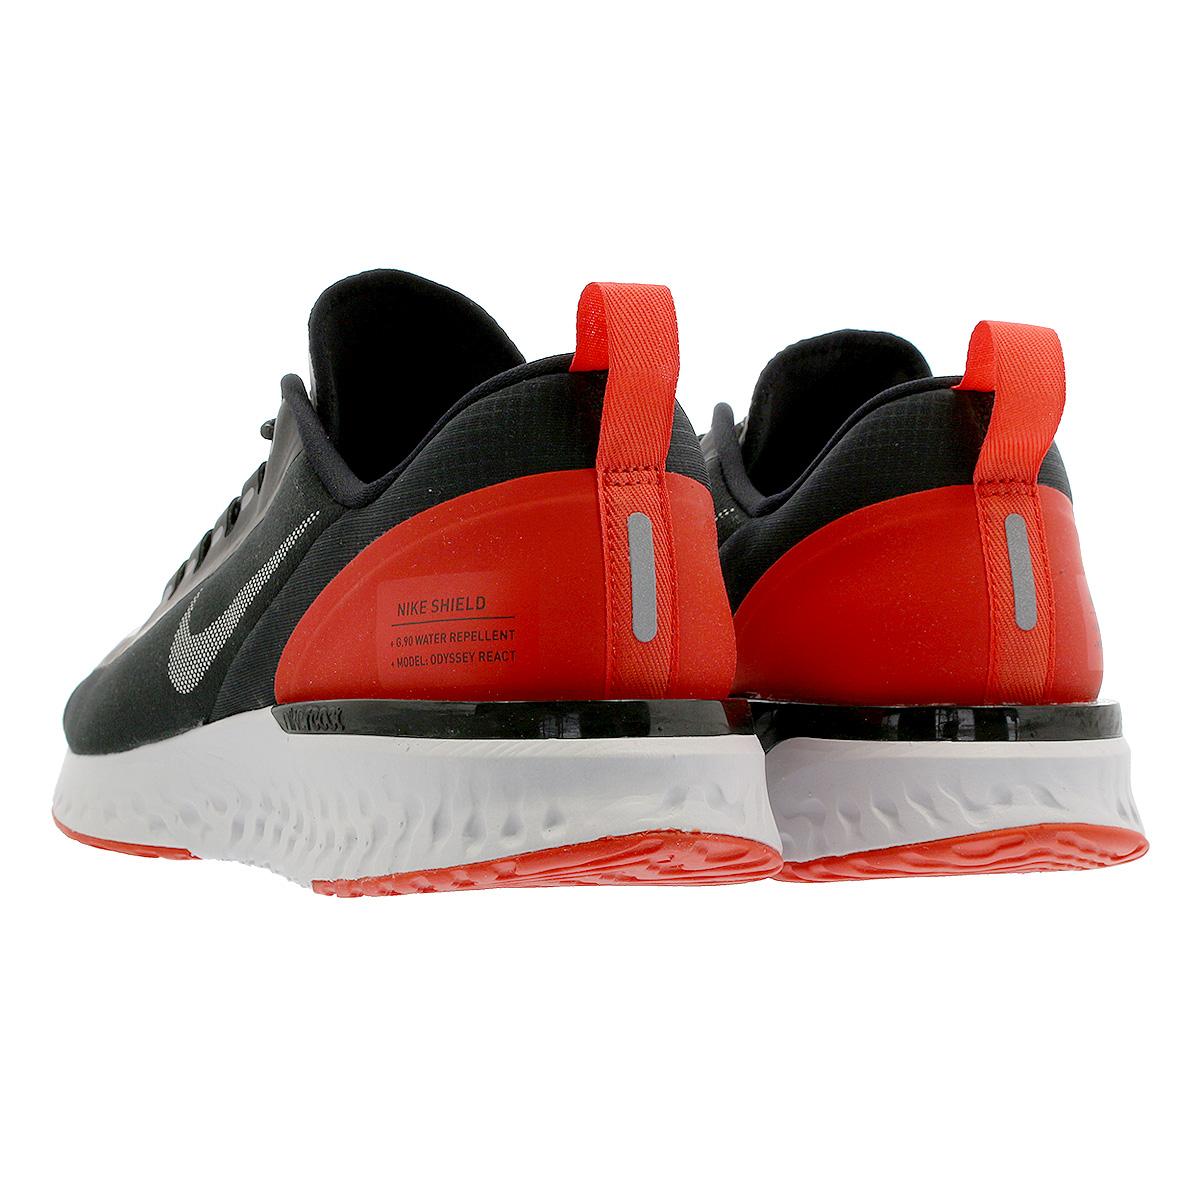 22327229f4ce NIKE ODYSSEY REACT SHIELD NRG Nike Odyssey re-act shield NRG BLACK REFLECT  SILVER HABANERO RED